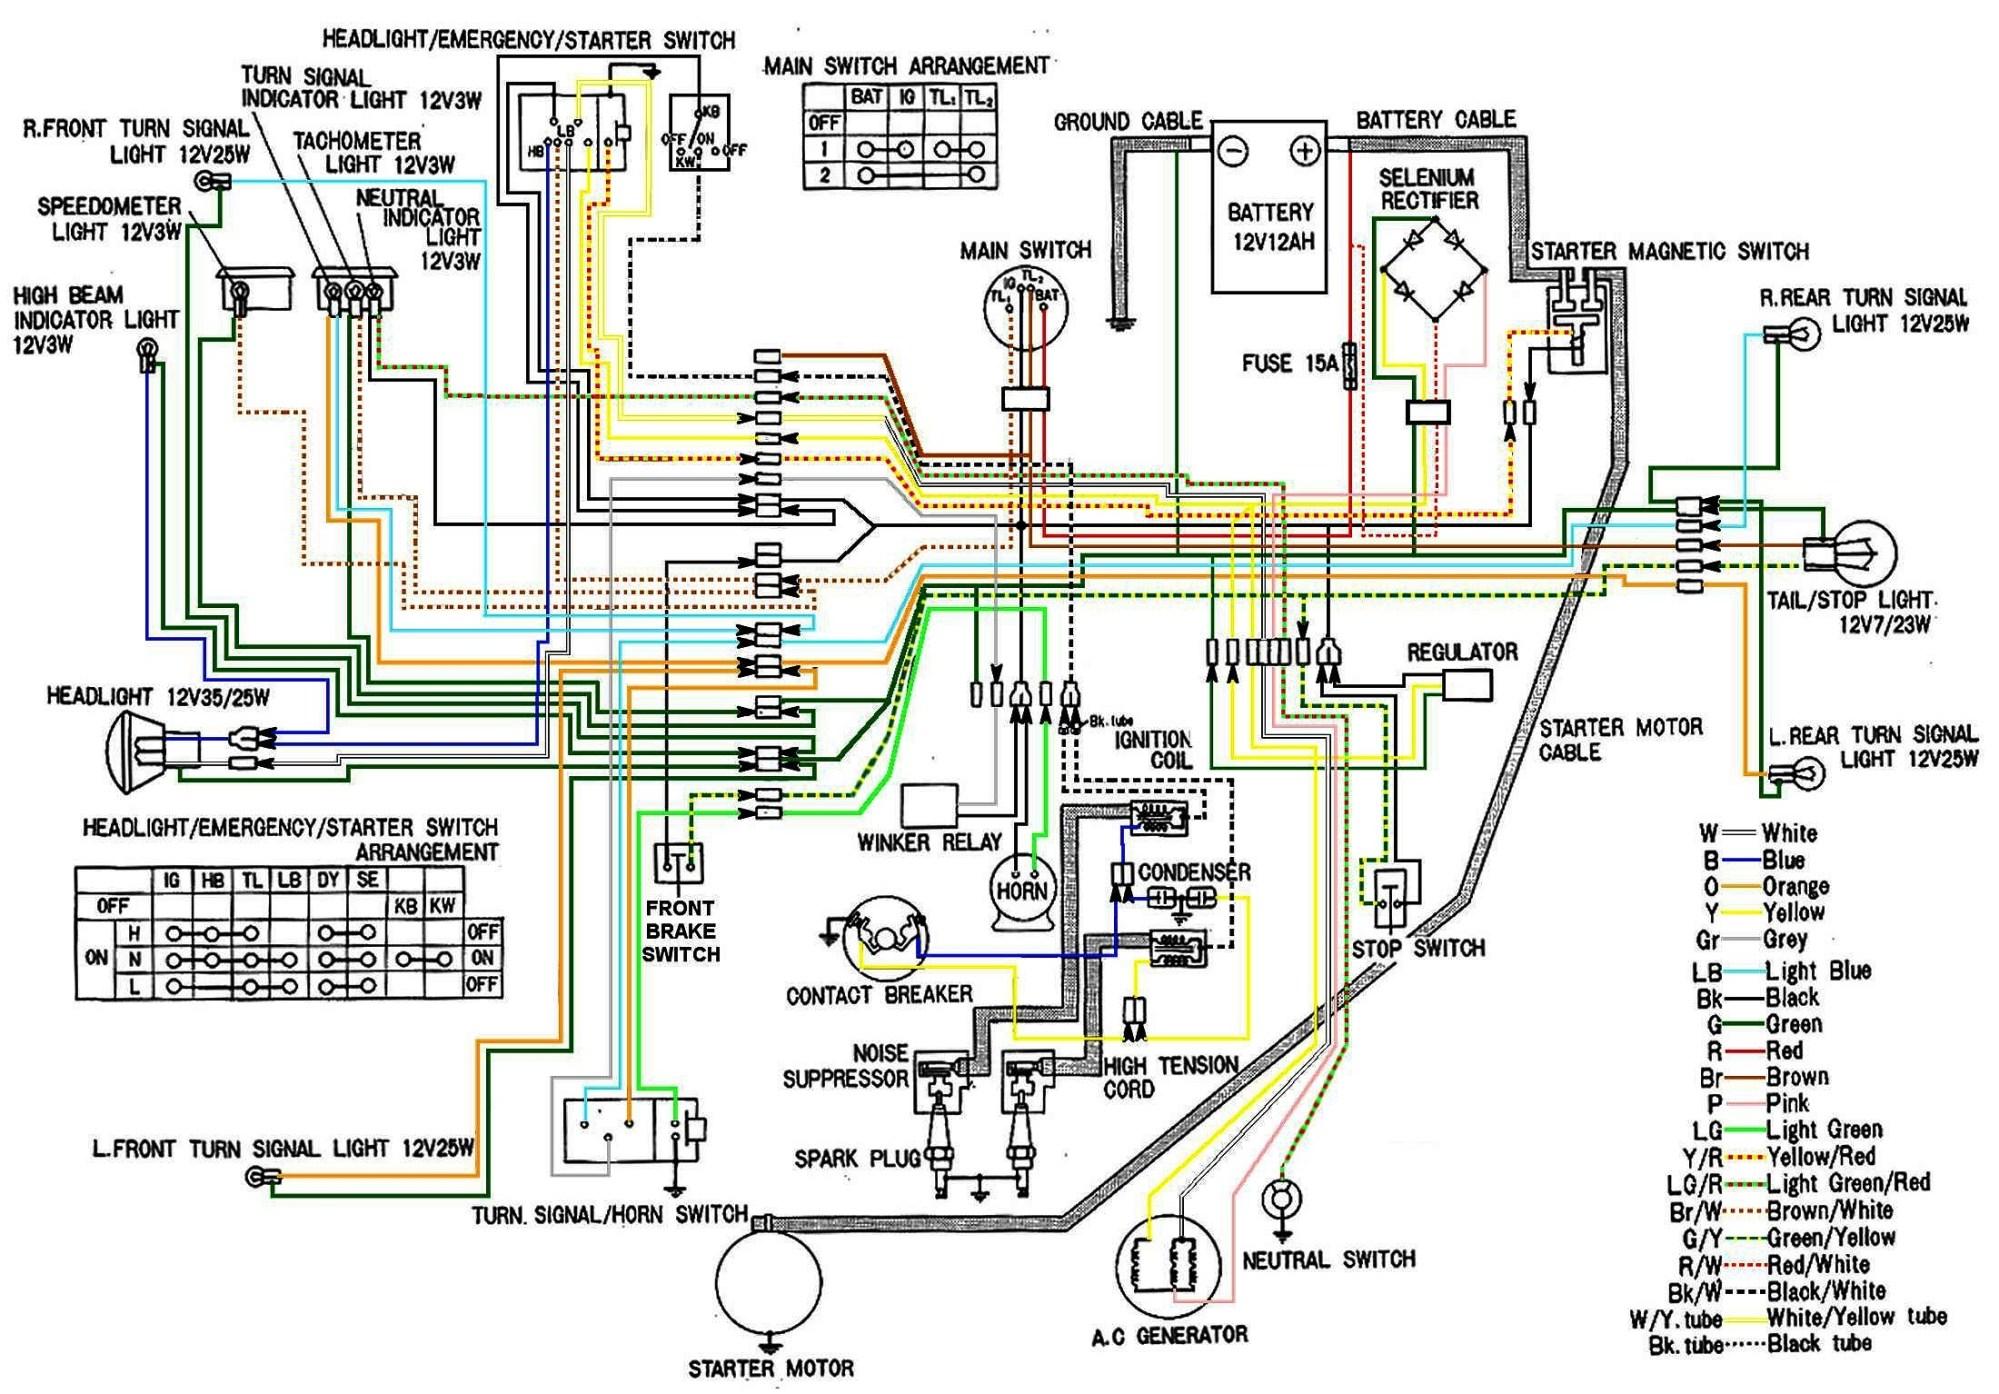 hight resolution of uniden cb wiring diagram wiring diagram cb550 wiring diagram cb wiring diagram